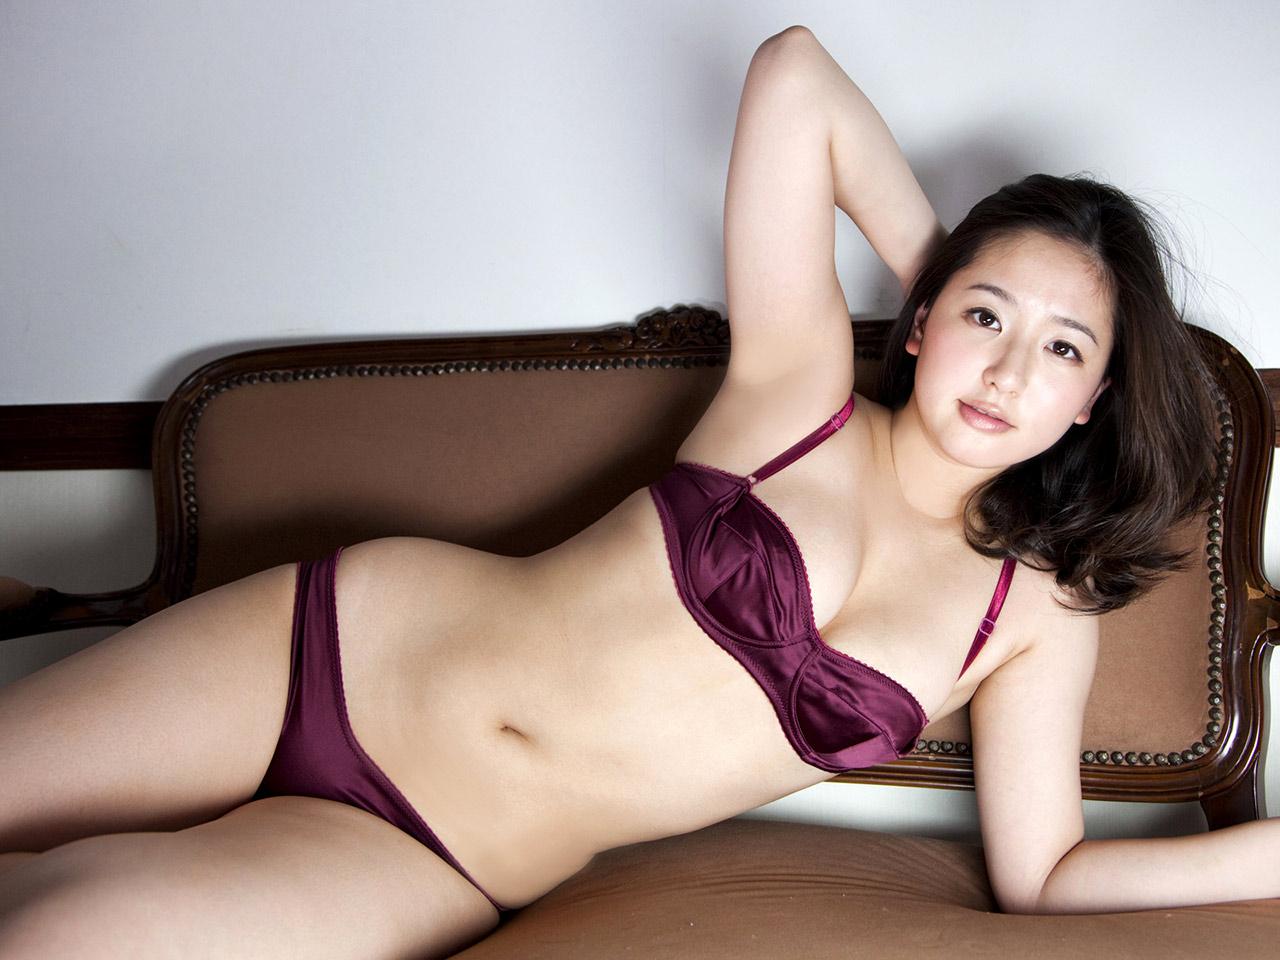 Jessy Mendiola Imagefap Fake Nude